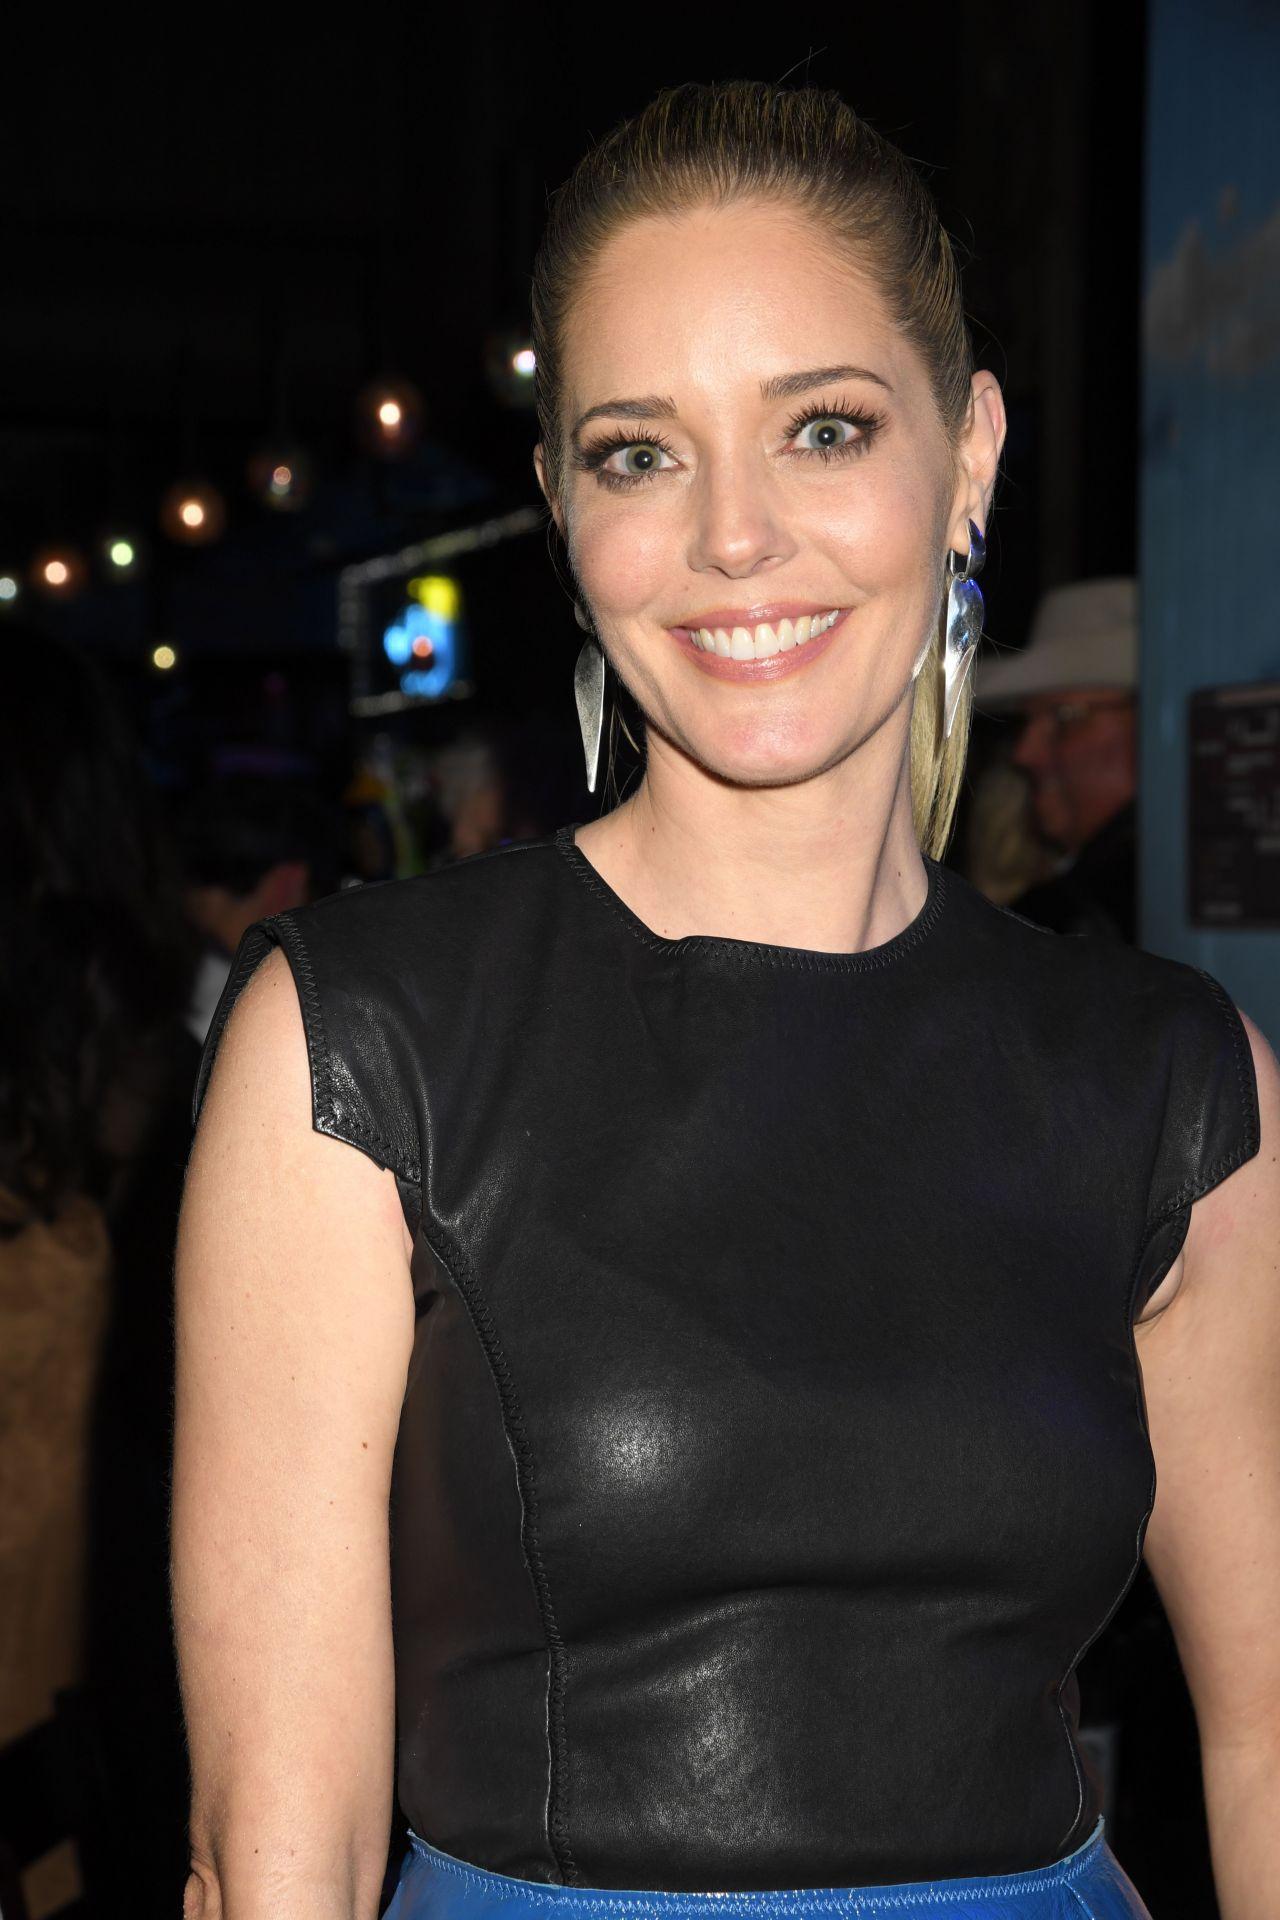 Kristen stewart and taylor lautner dating 2011 6